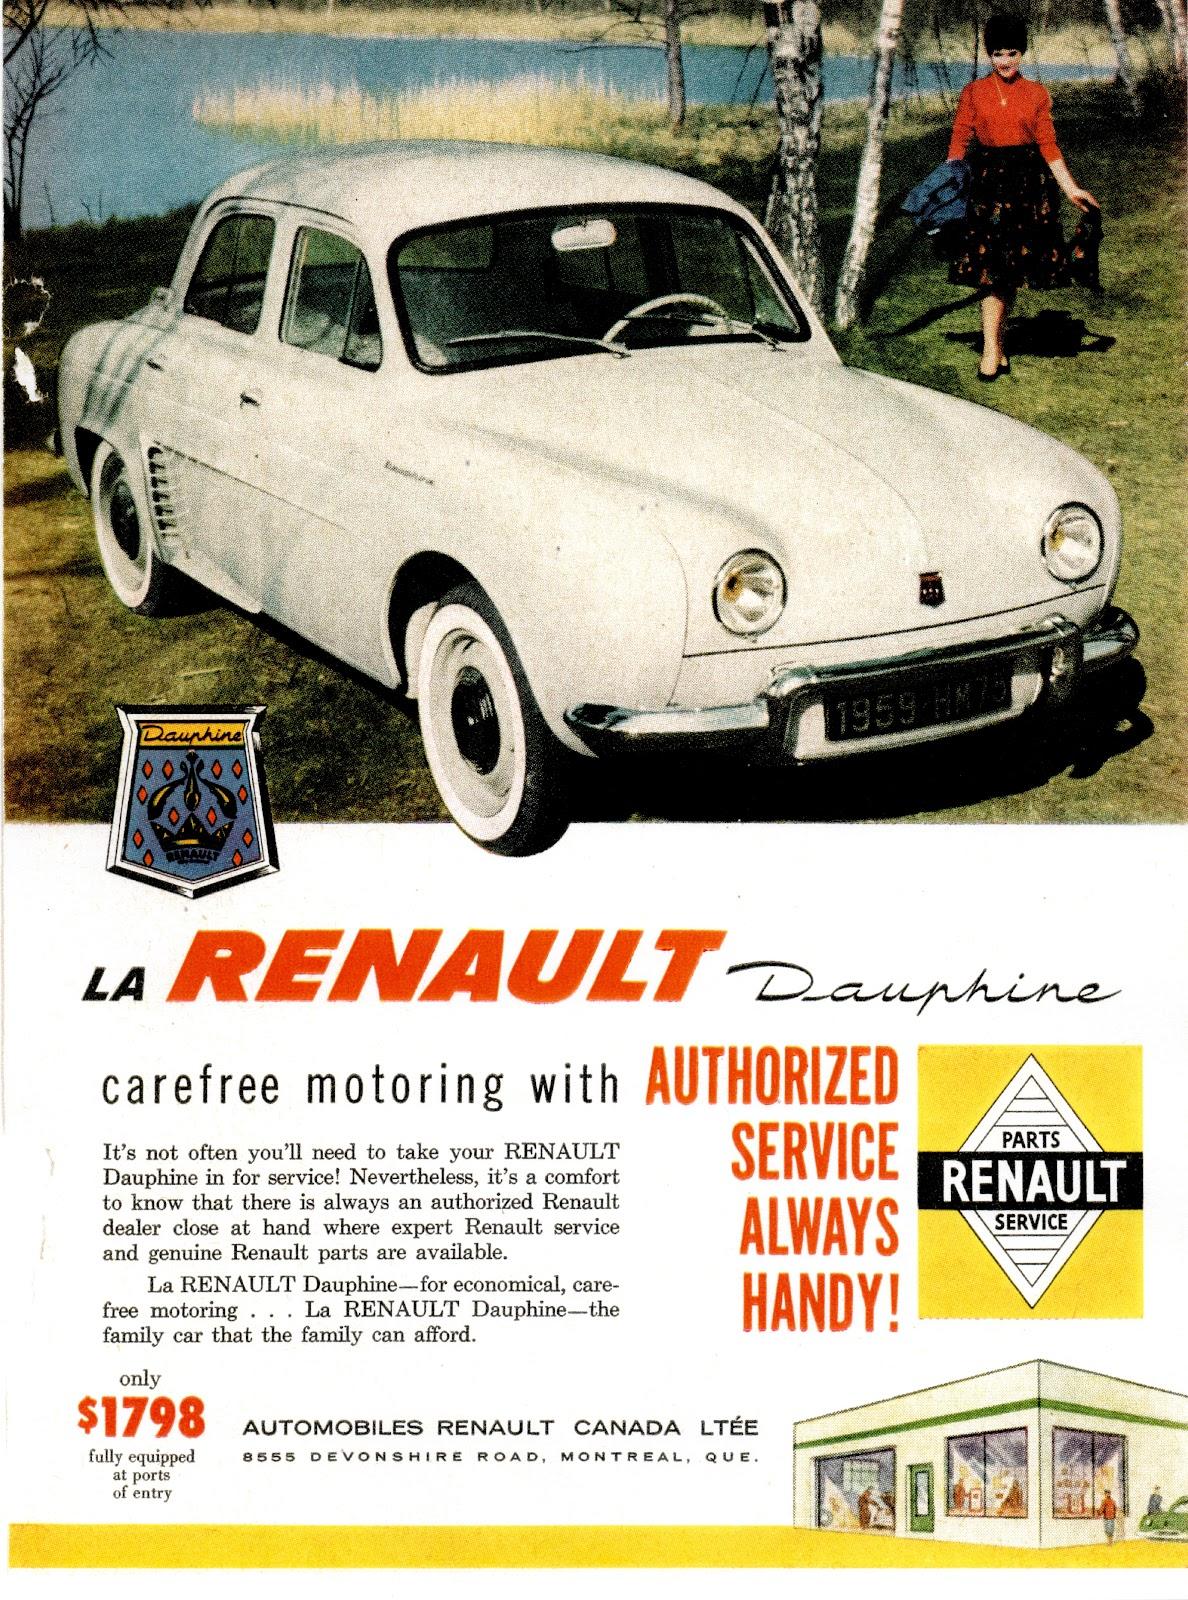 1959-Renault-Dauphine-Canada.jpg